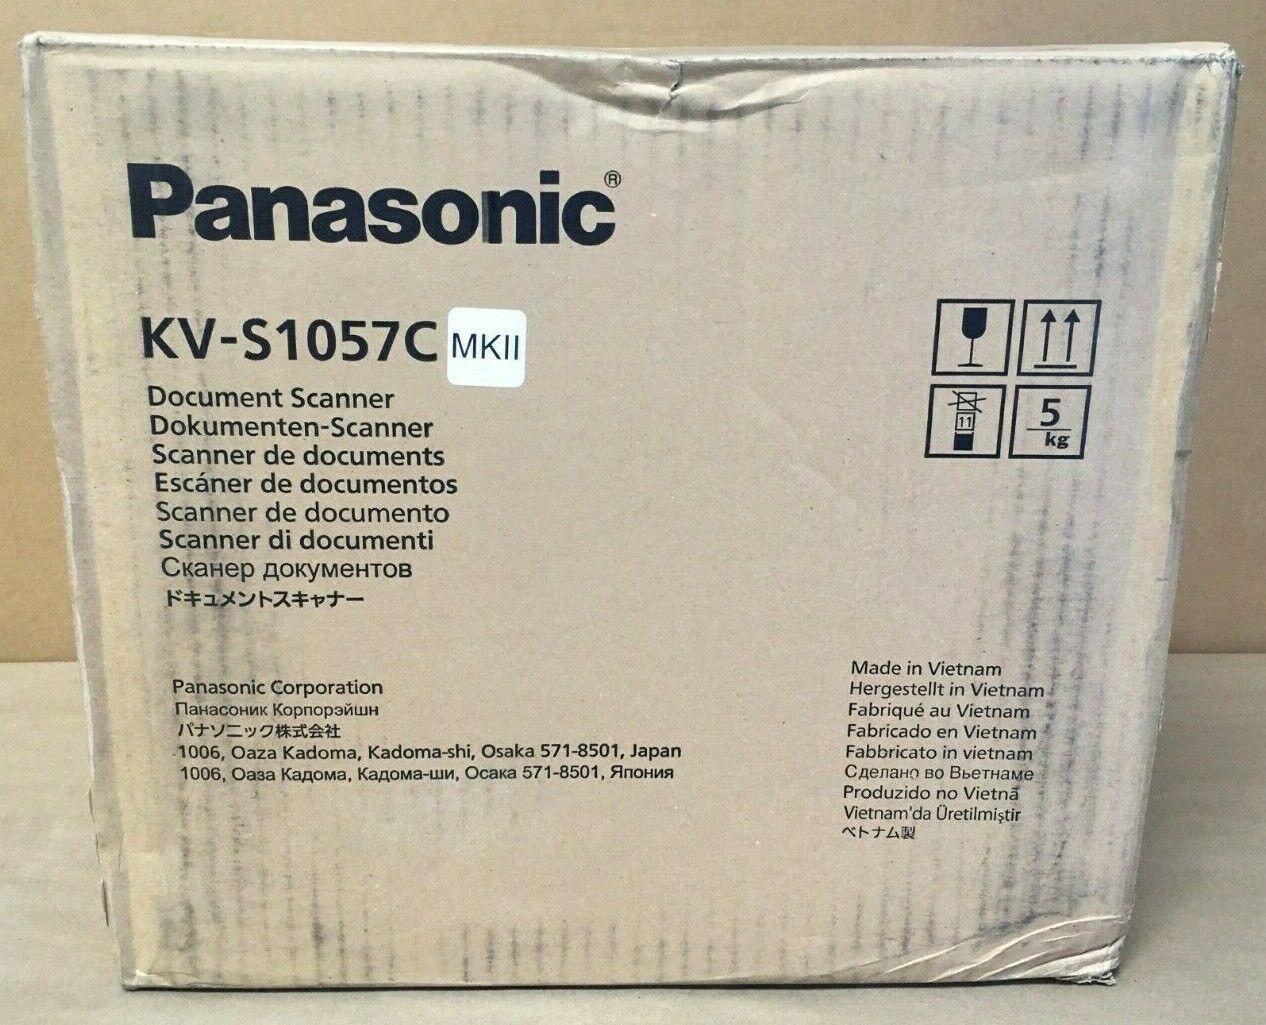 Panasonic Sheetfed Document Scanner 200/300 dpi Color KV-S10